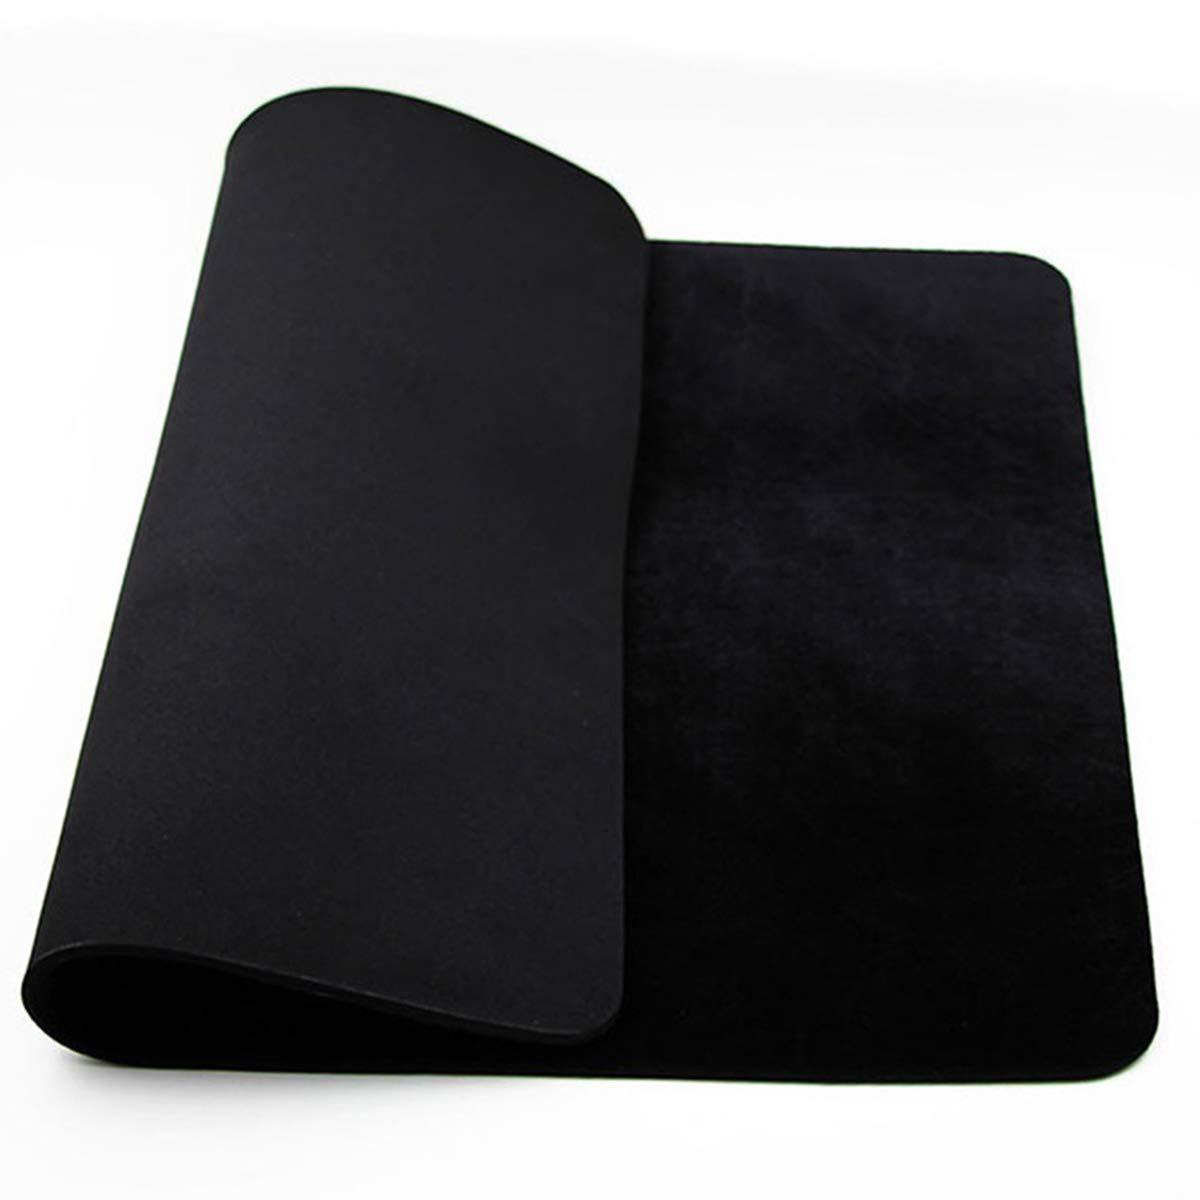 OUERMAMA Large Size 23.62'' x 15.75'' Black Professional Poker Card Deck Mat Pad Close-up Magic Accessories